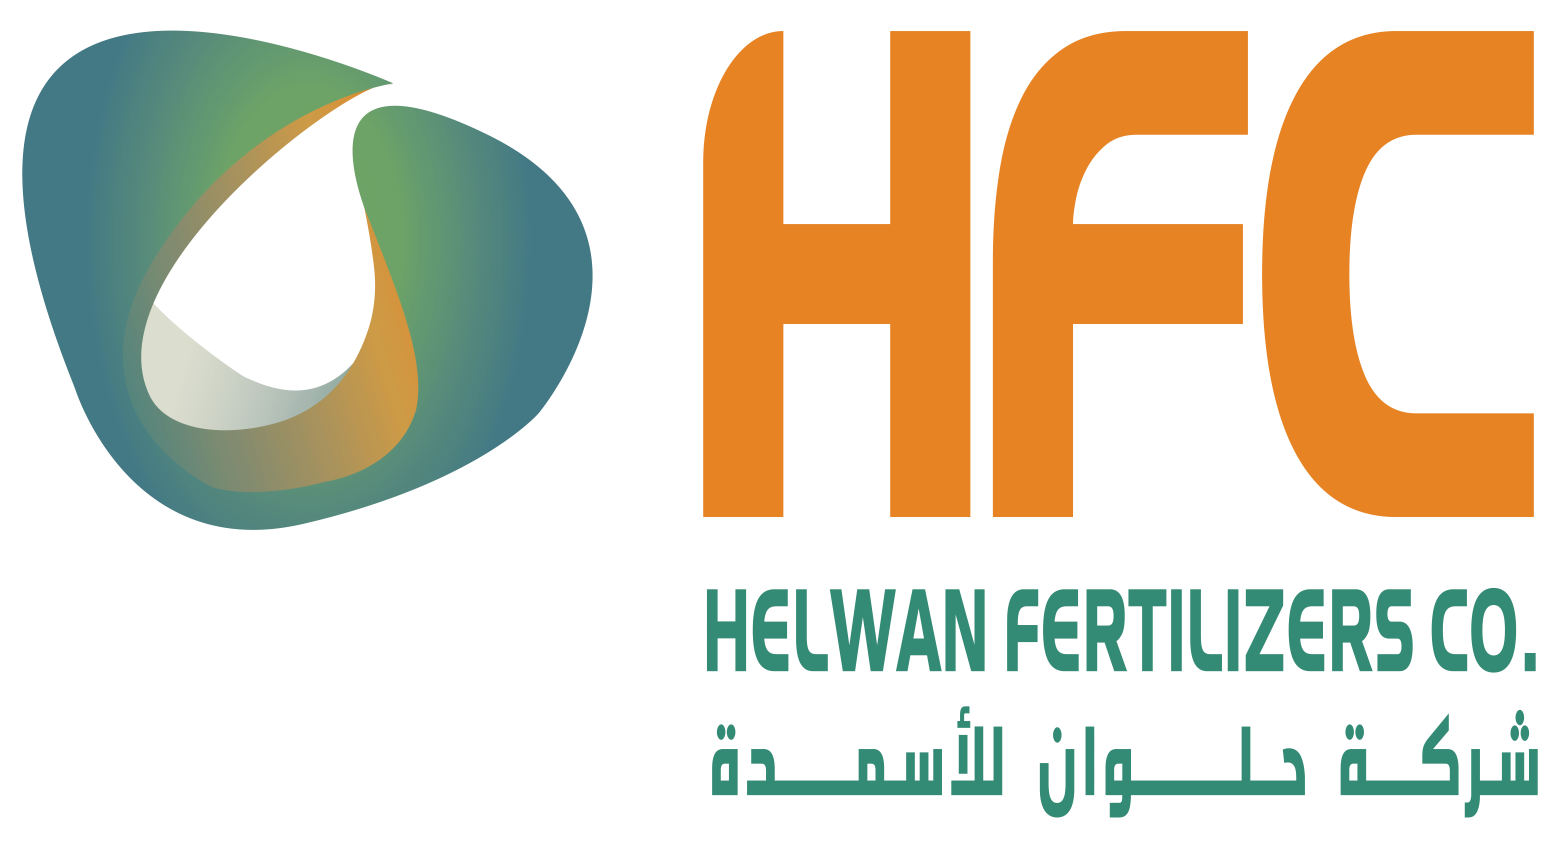 HFC Logo Image